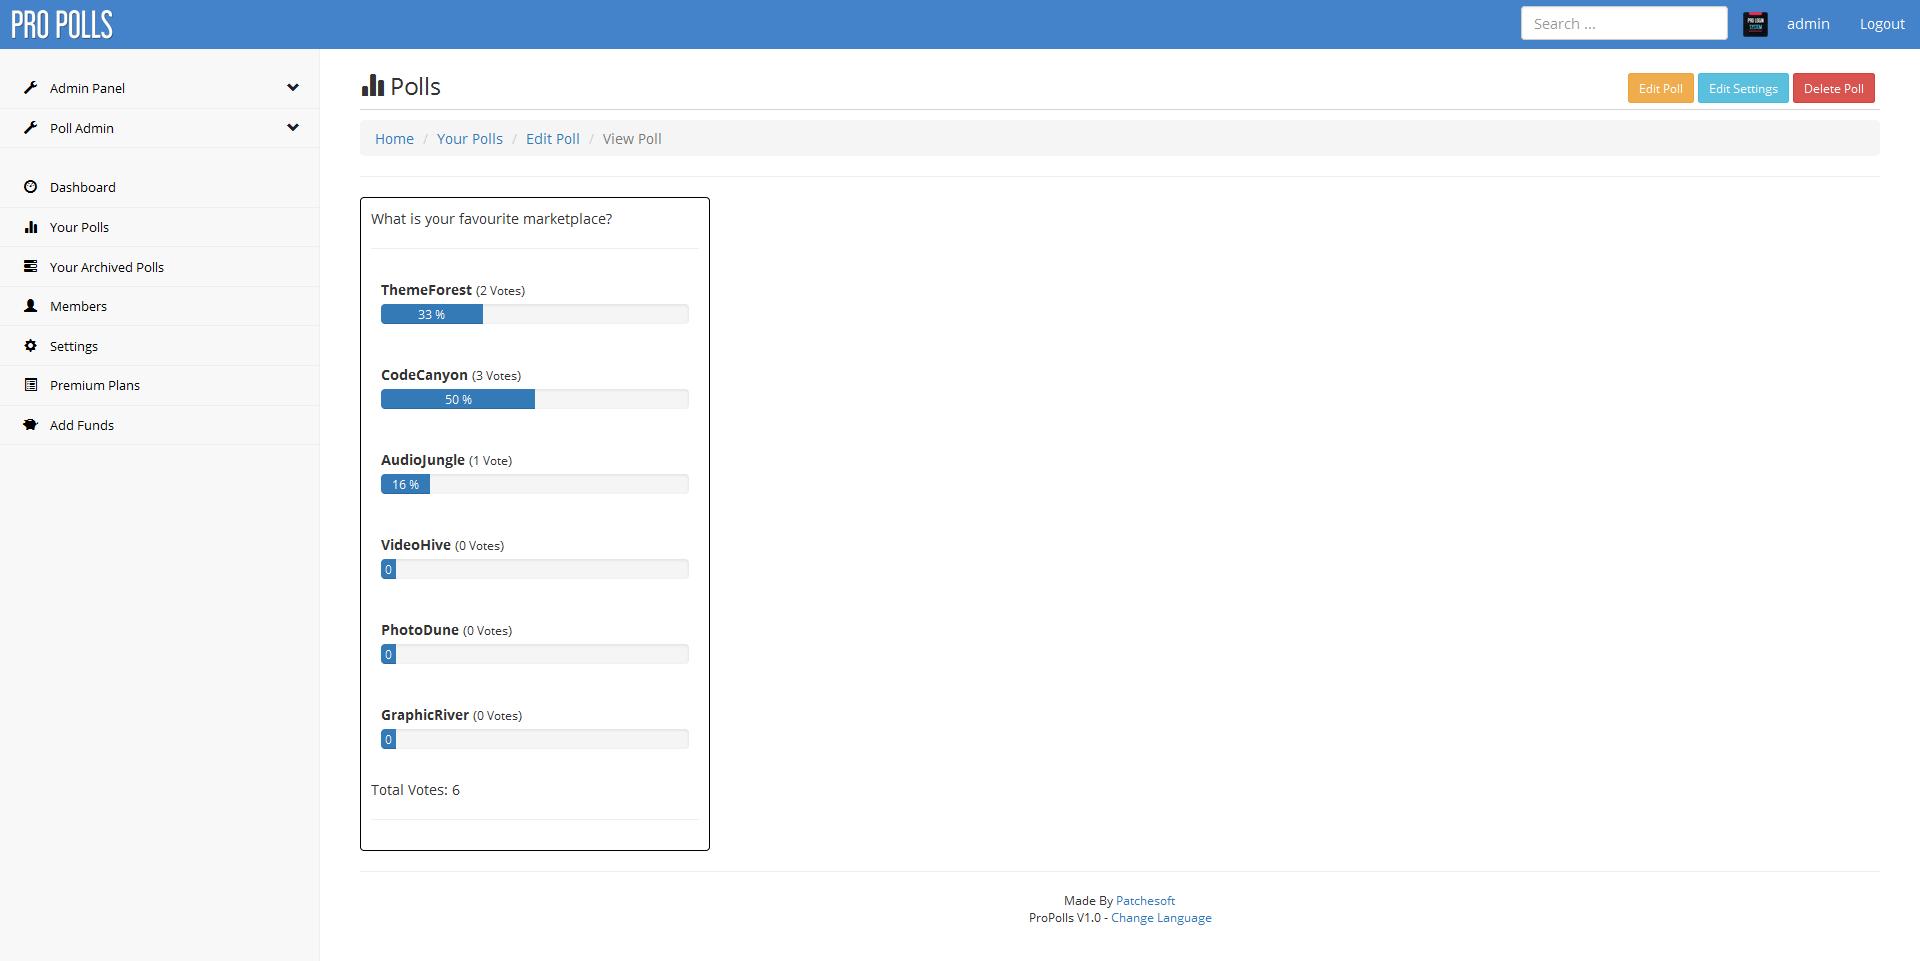 Pro Polls - PHP Poll Vote Script